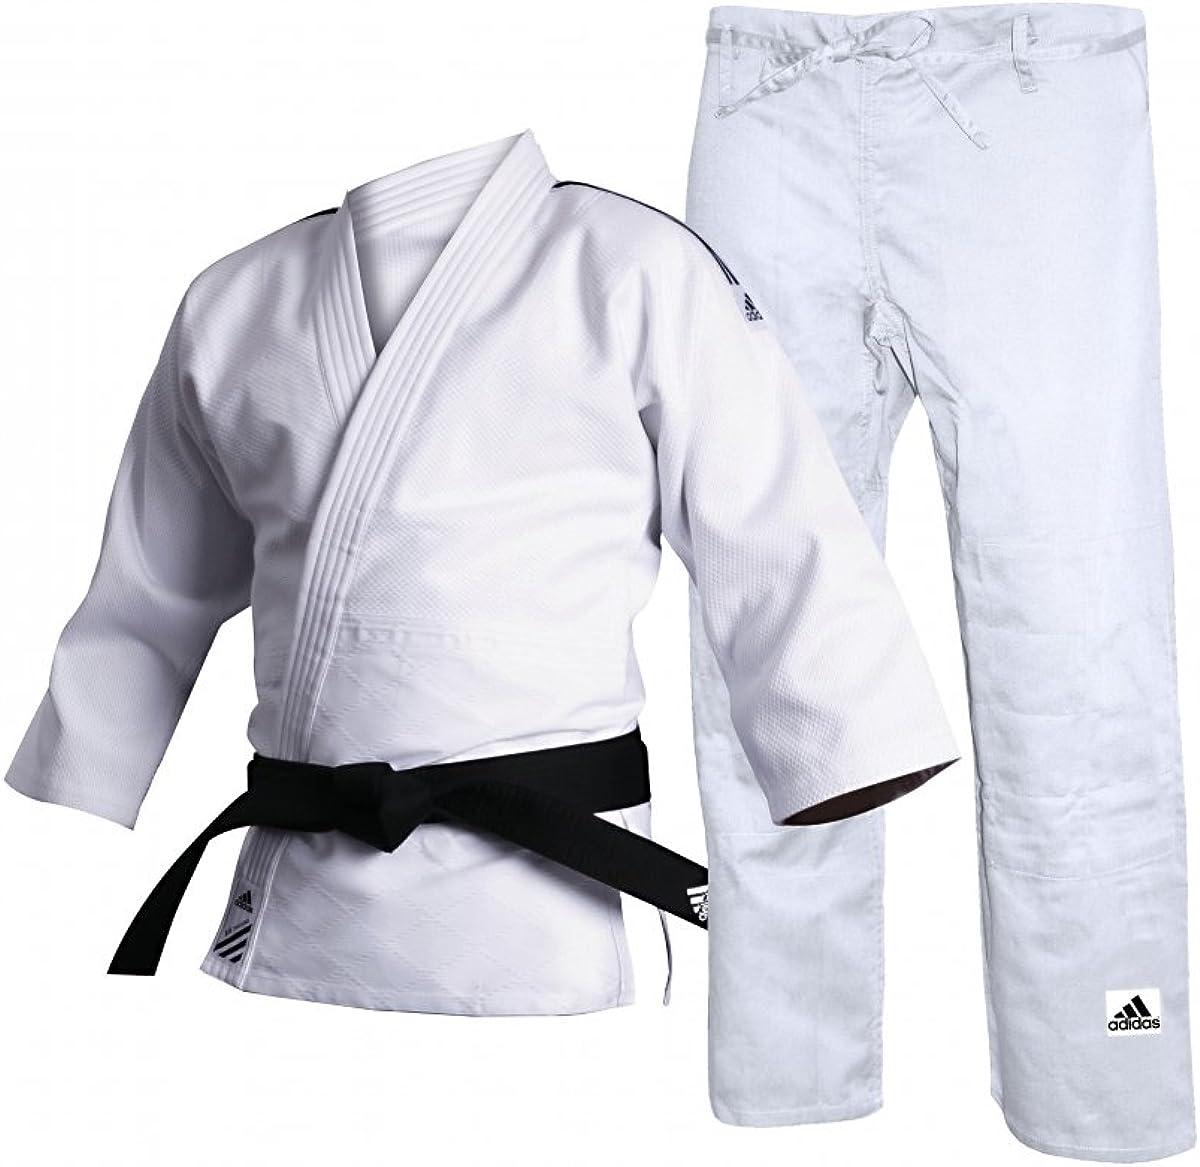 privado Tiempos antiguos objetivo  Adidas J500 Unisex Judo Uniform: Amazon.co.uk: Clothing